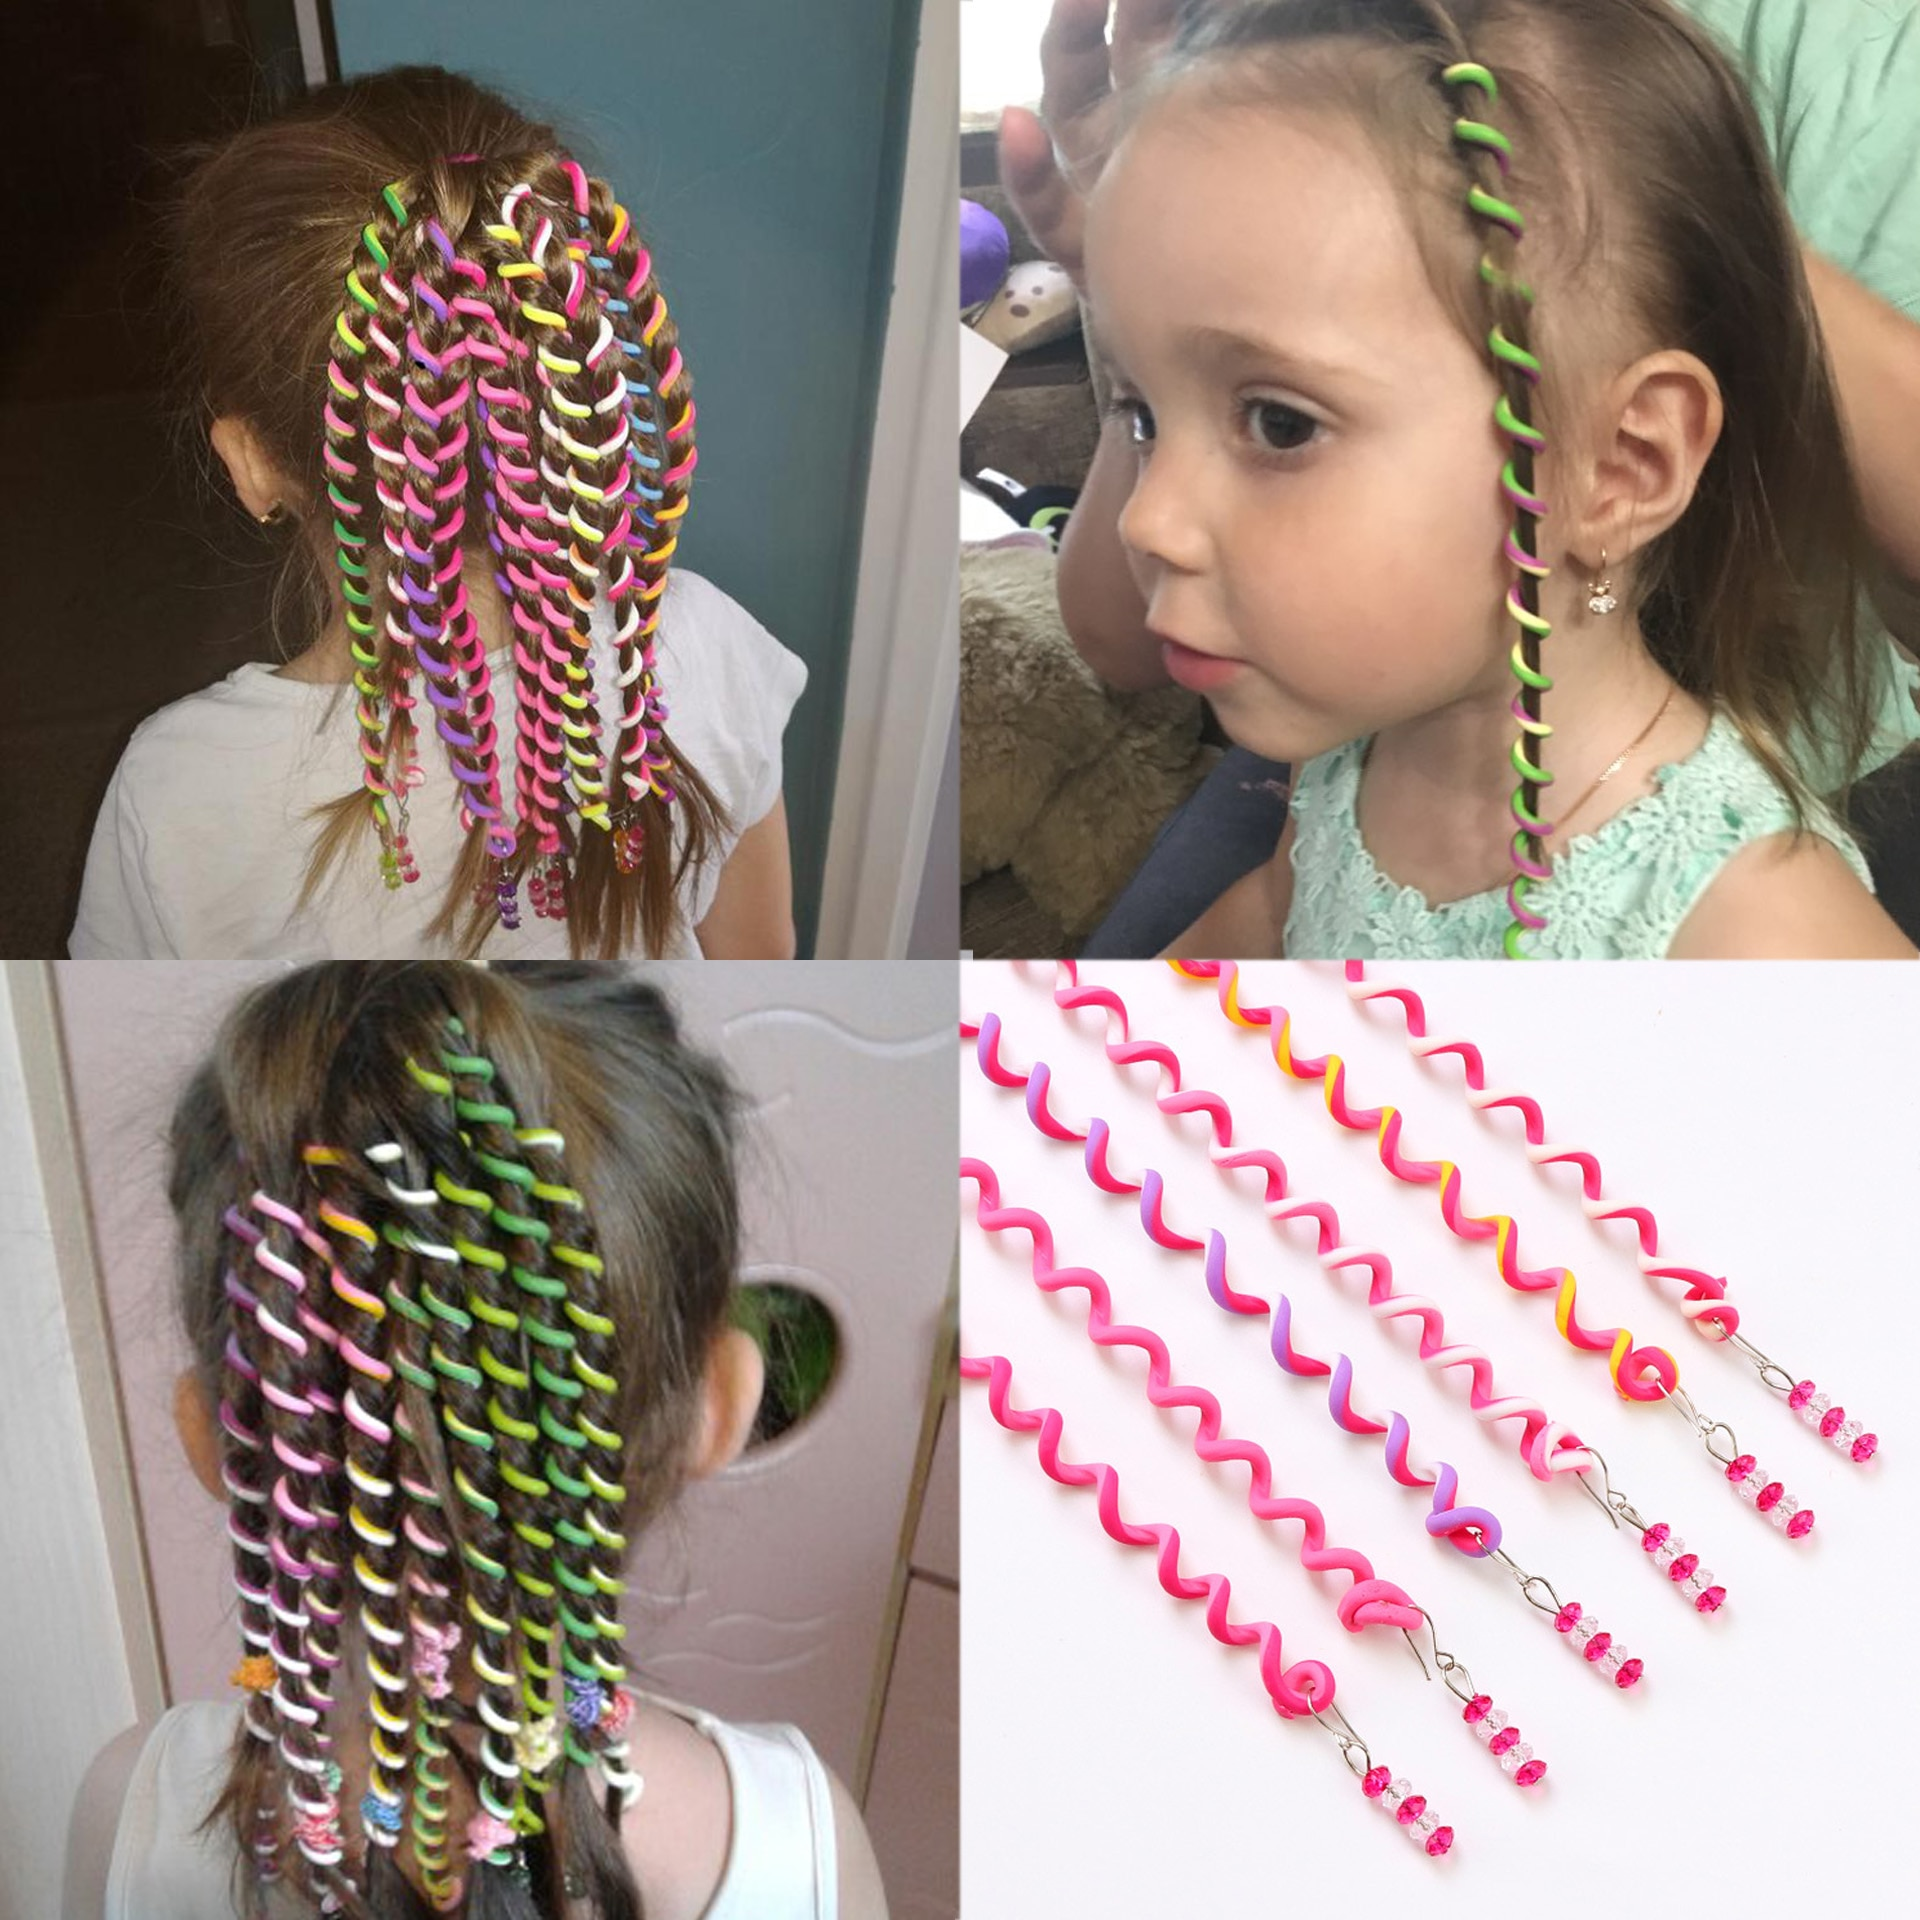 6 pcs arco-íris cor bandana bonito meninas faixa de cabelo cristal longo elástico faixas de cabelo acessórios de cabelo cor aleatória